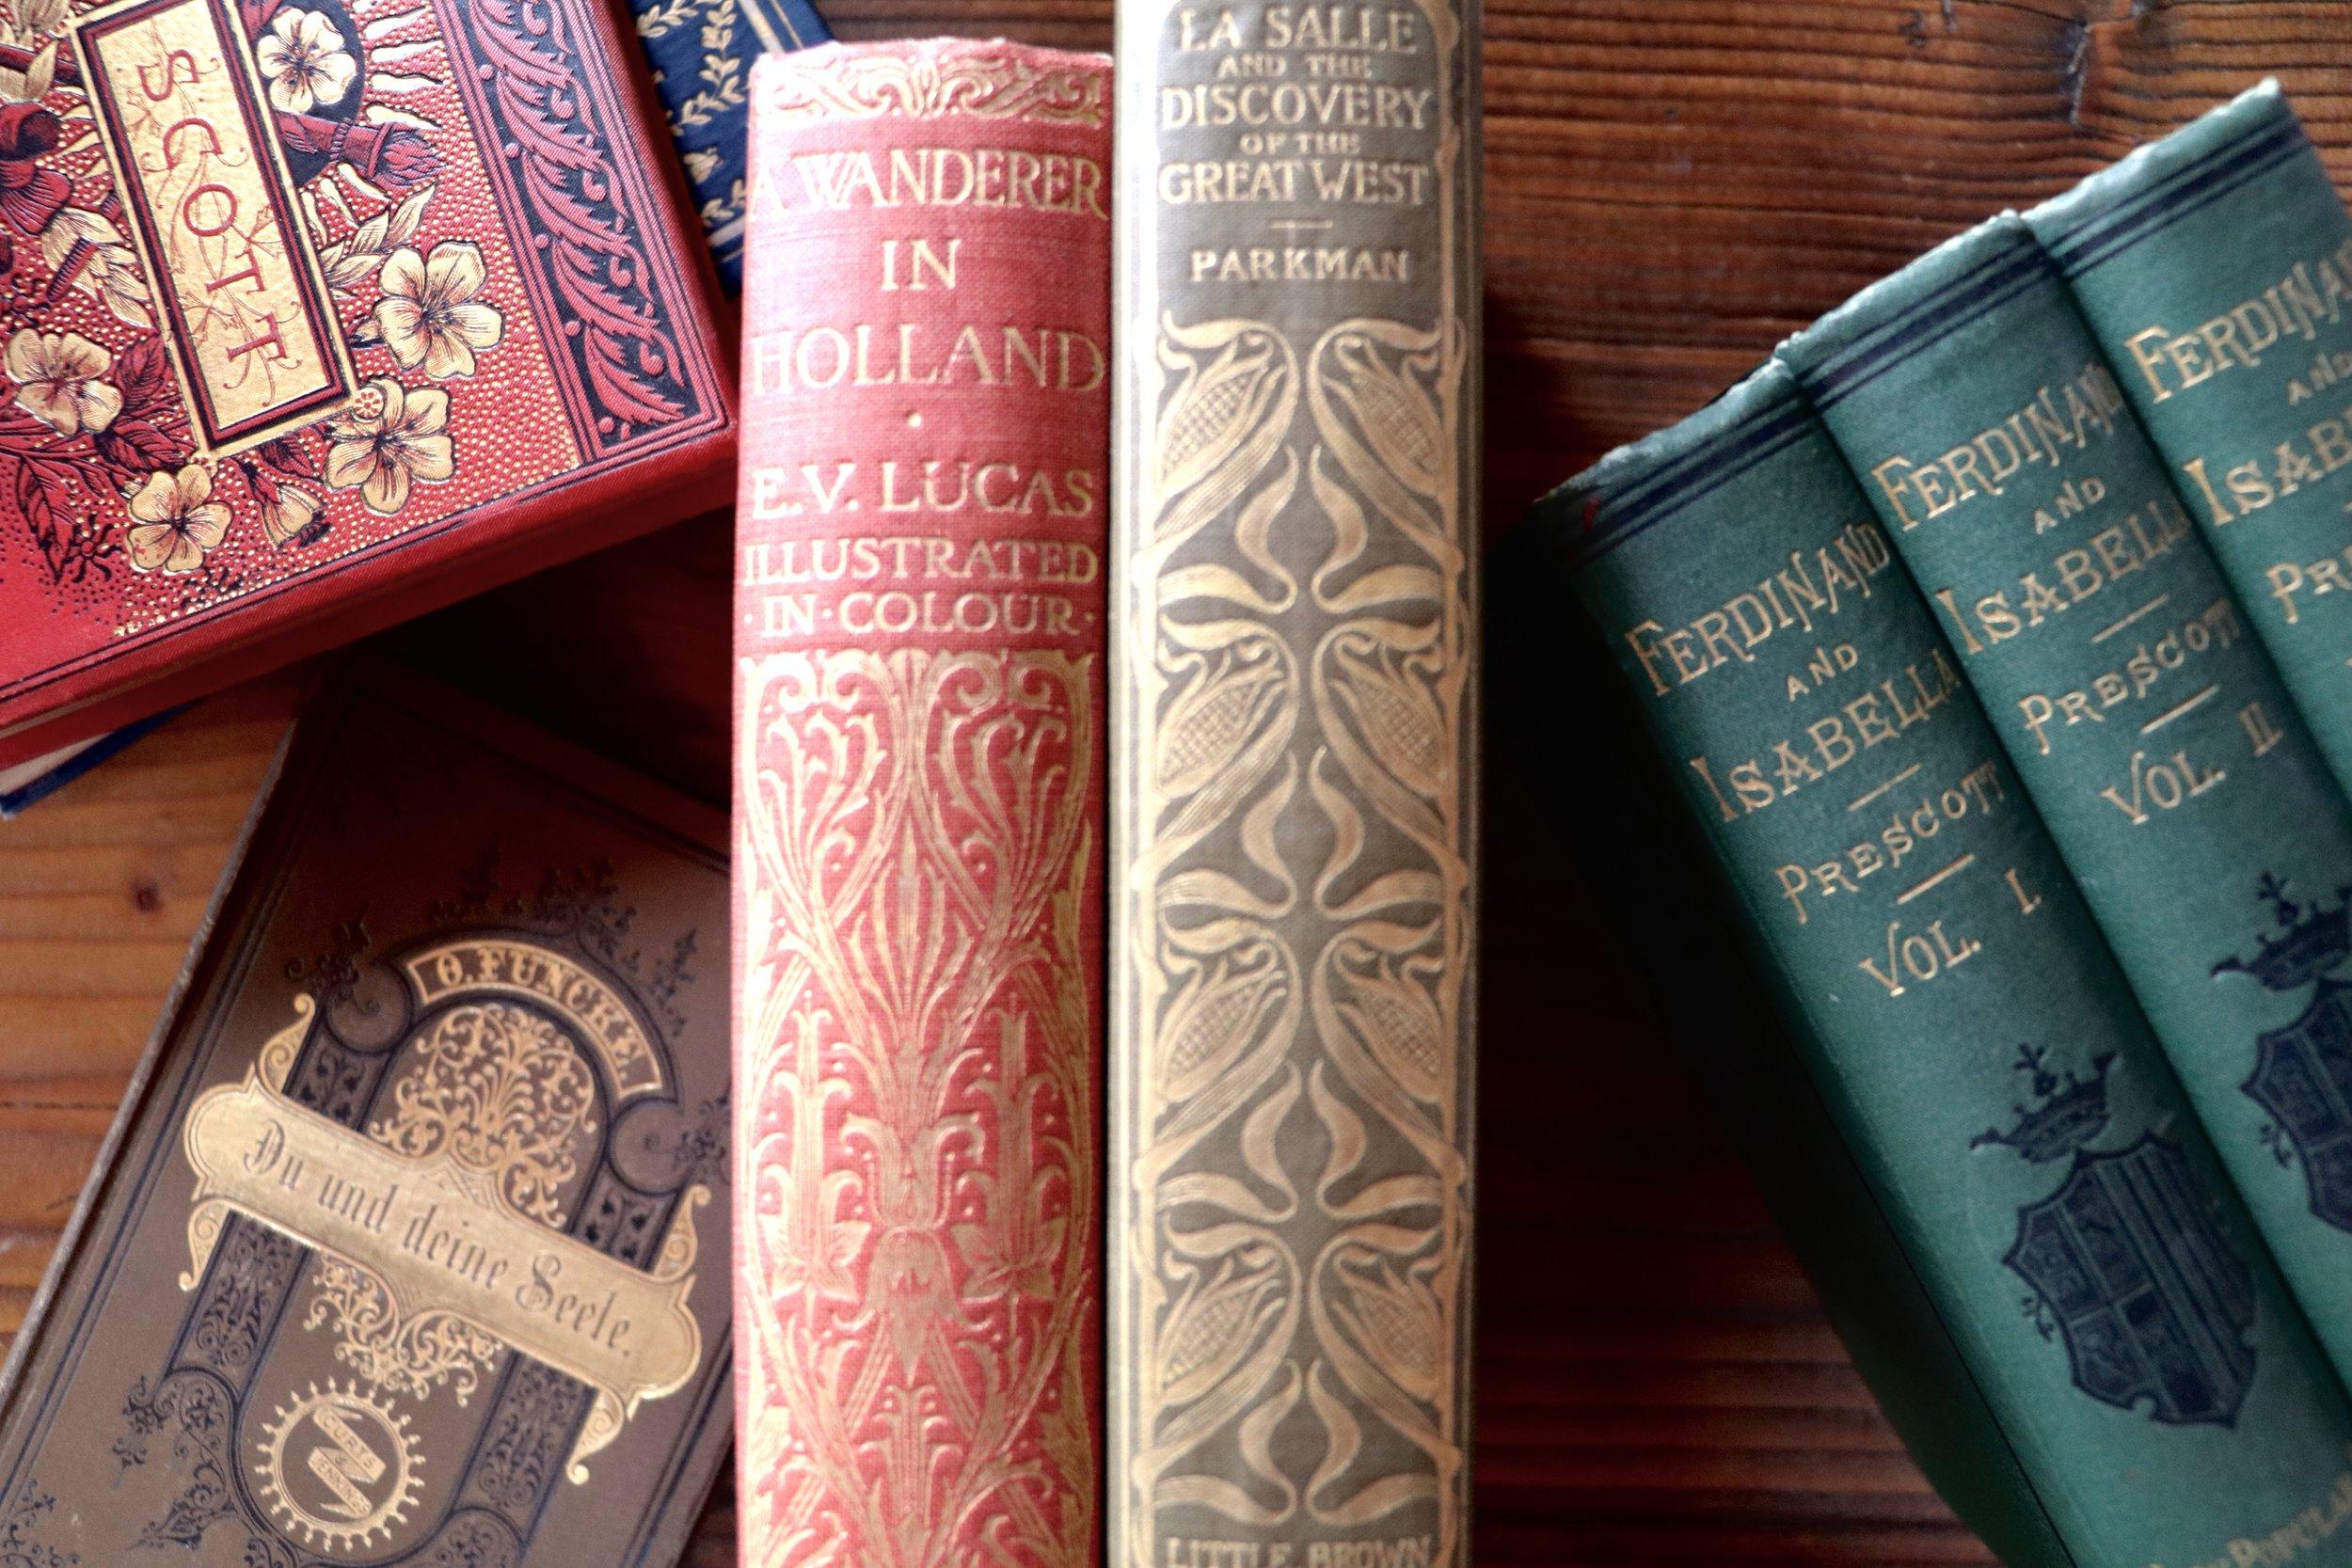 antiquarian books.JPG